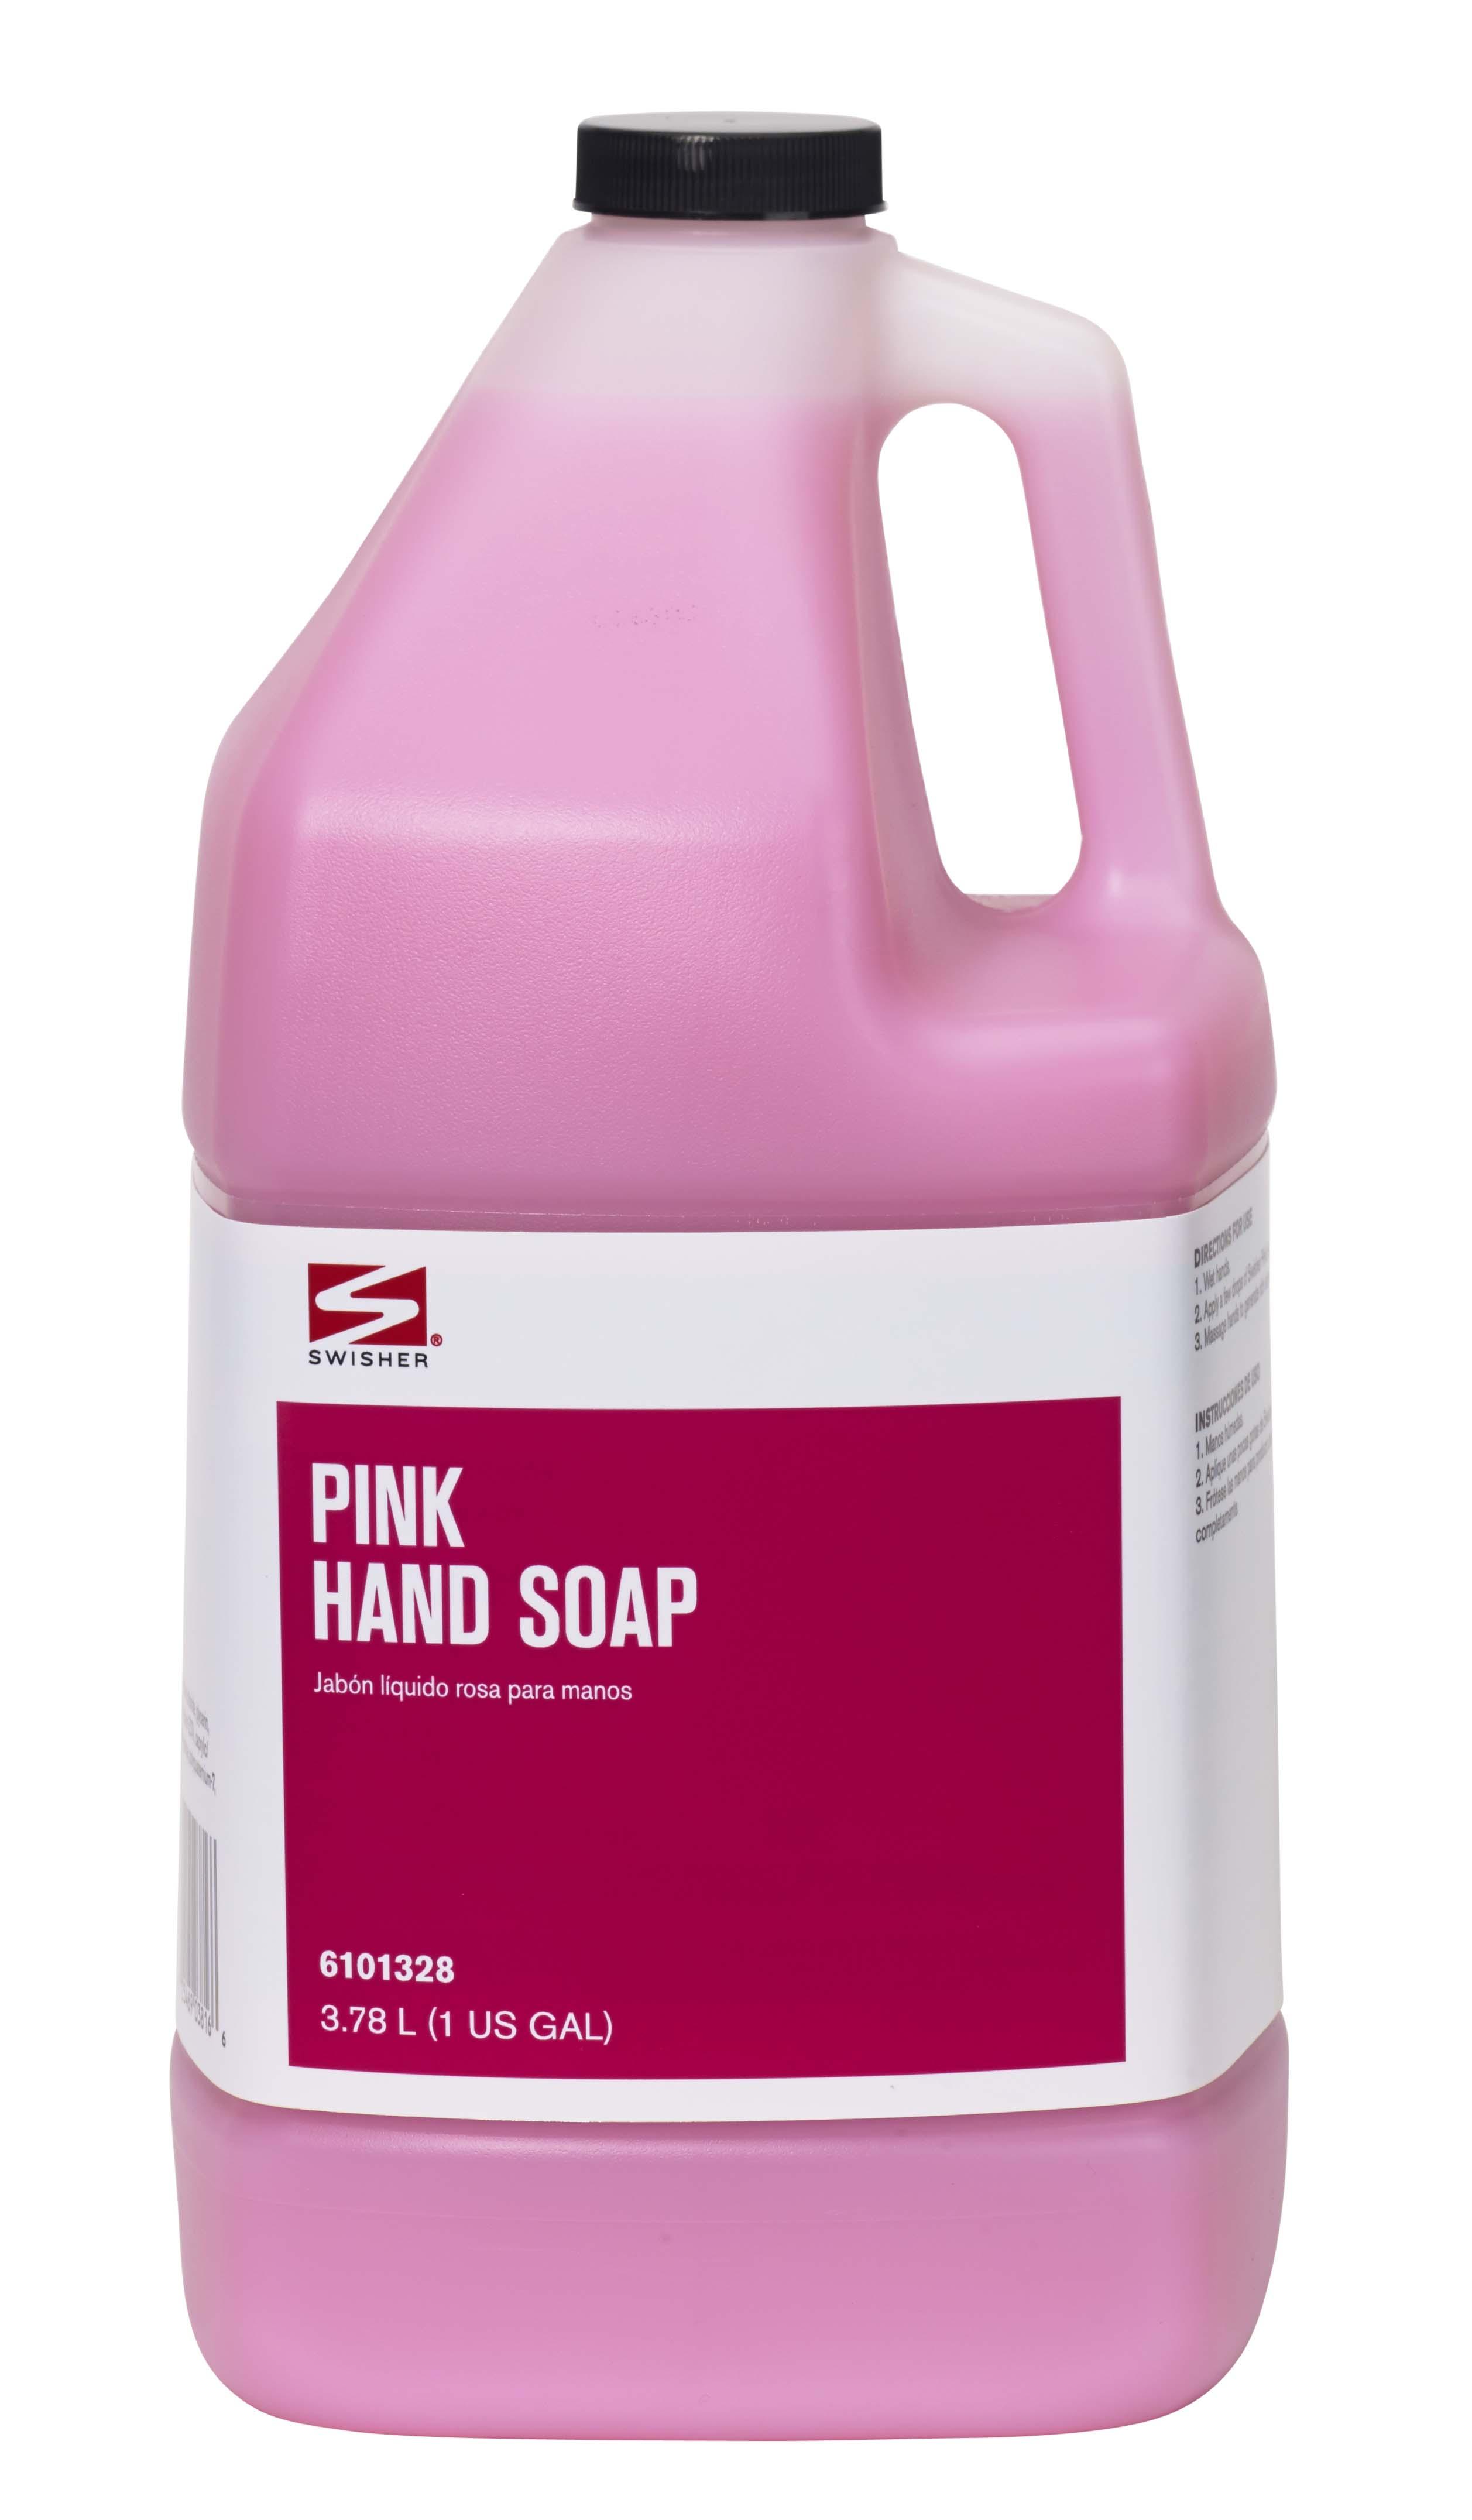 Swisher Pink Hand Soap